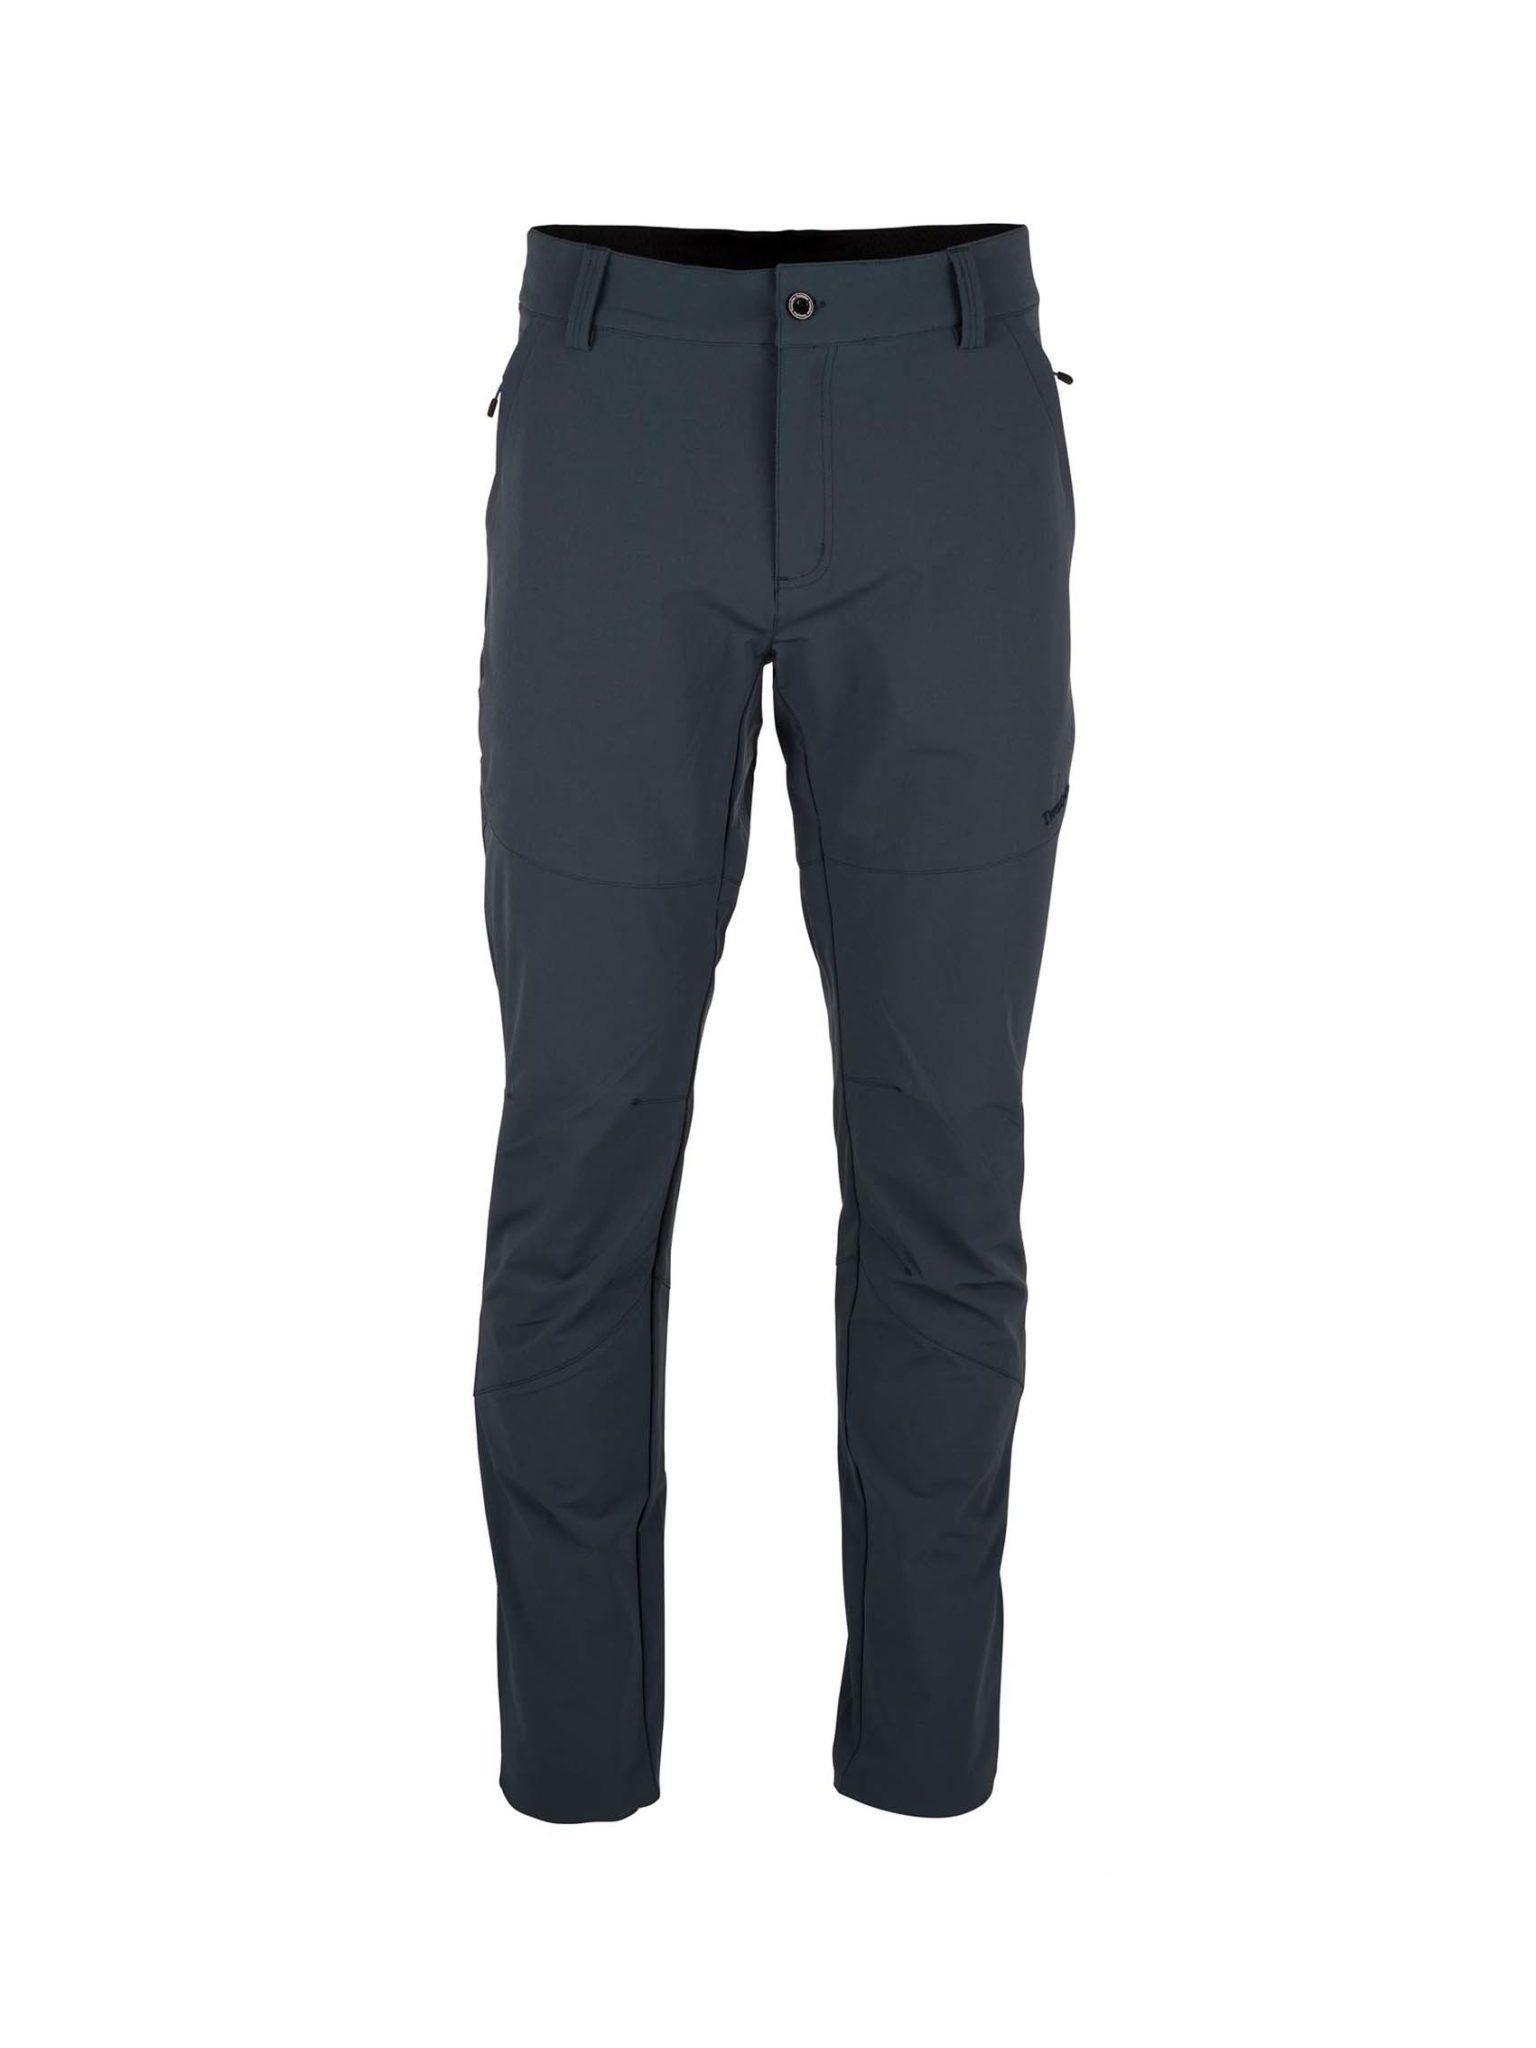 Twentyfour Oslo ST bukse, blågrå